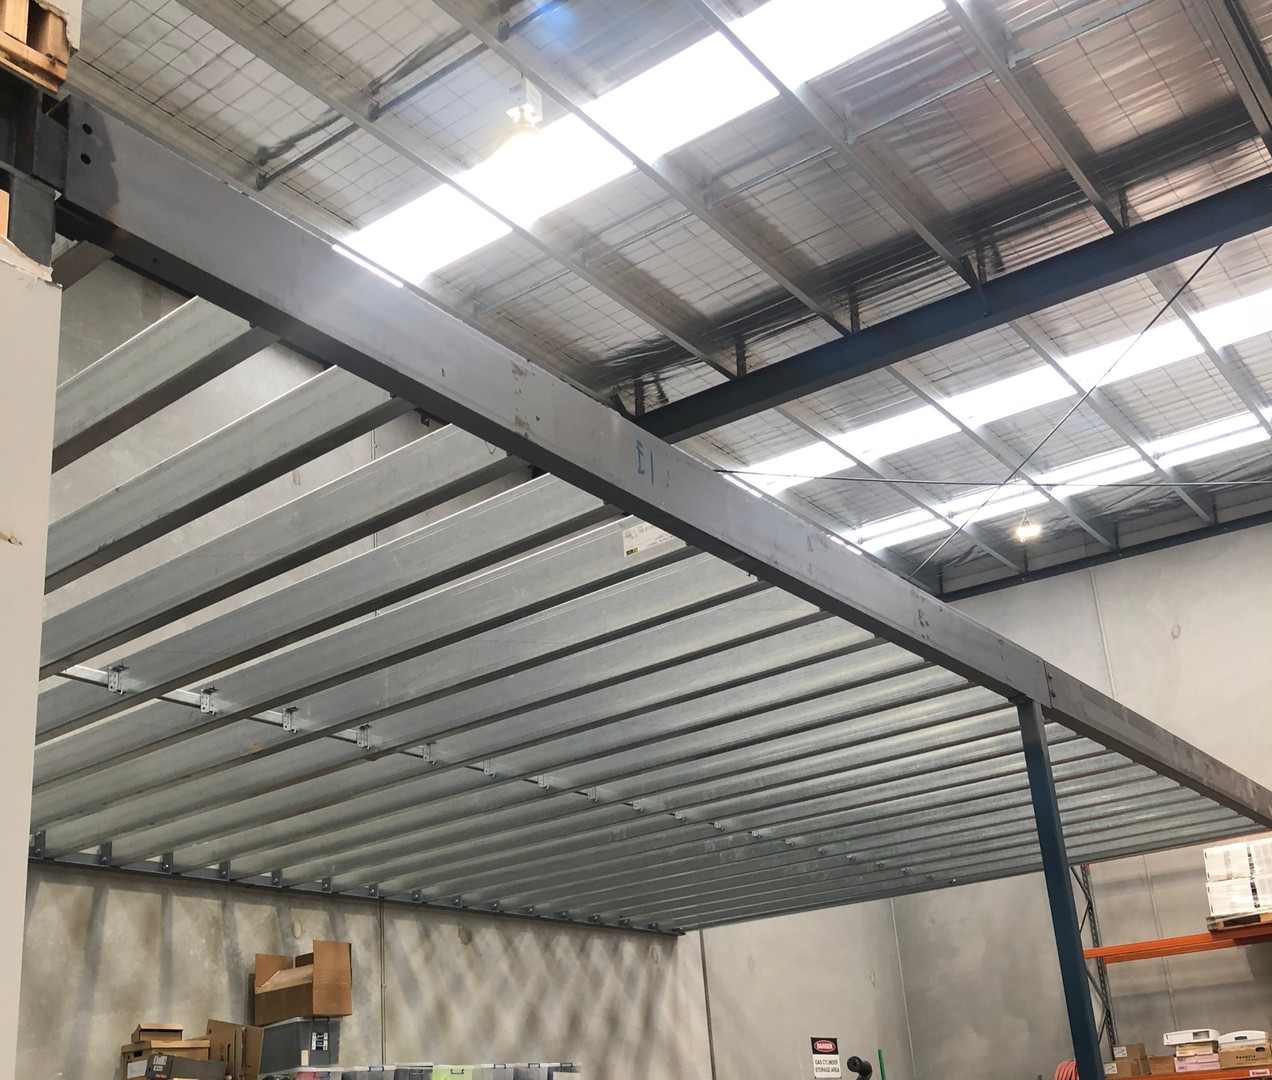 beams install perlins